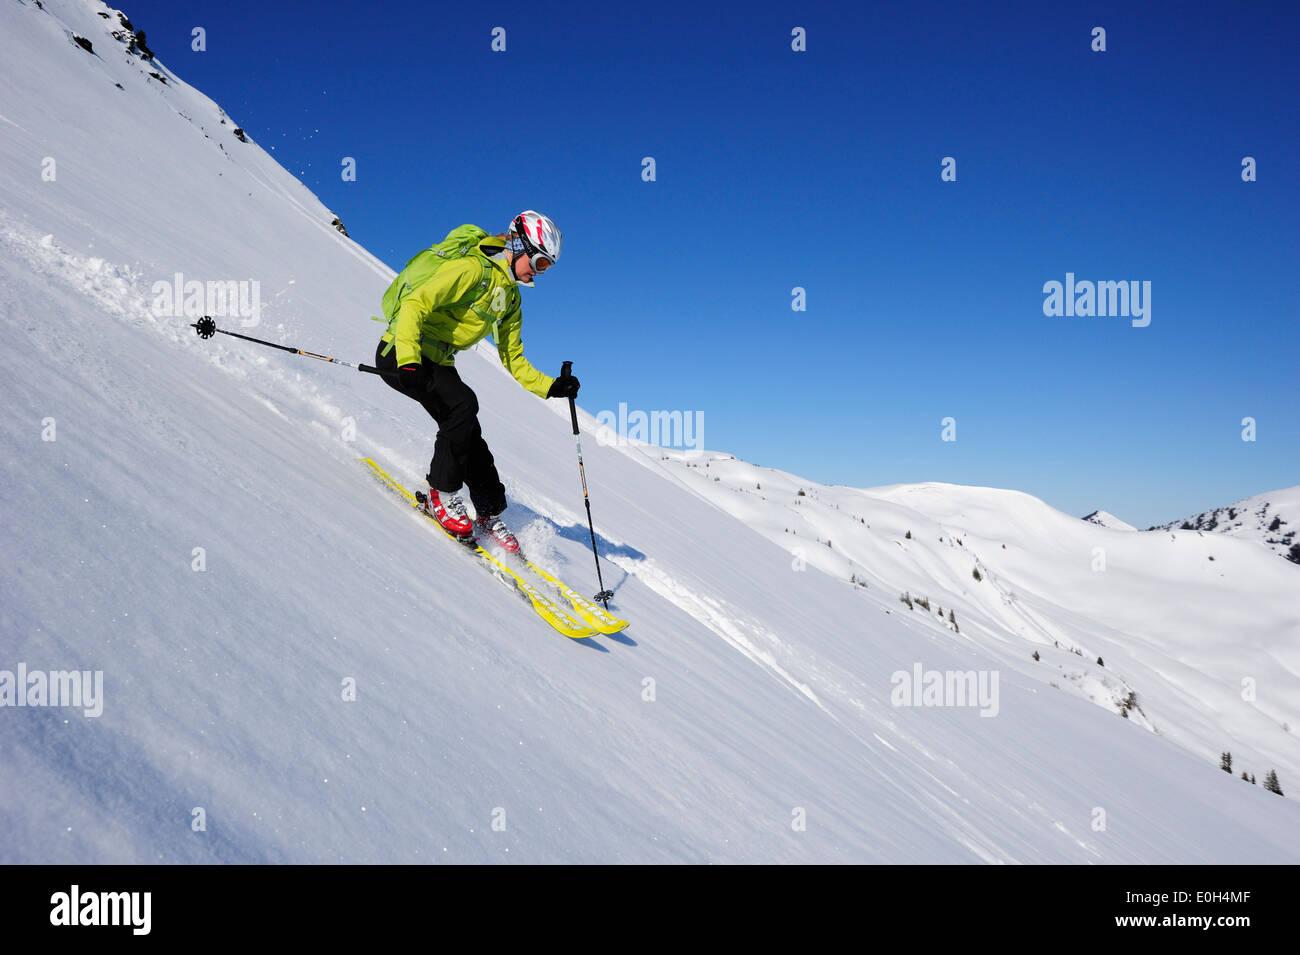 Female backcountry skier downhill skiing from Brechhorn, Kitzbuehel Alps, Tyrol, Austria - Stock Image